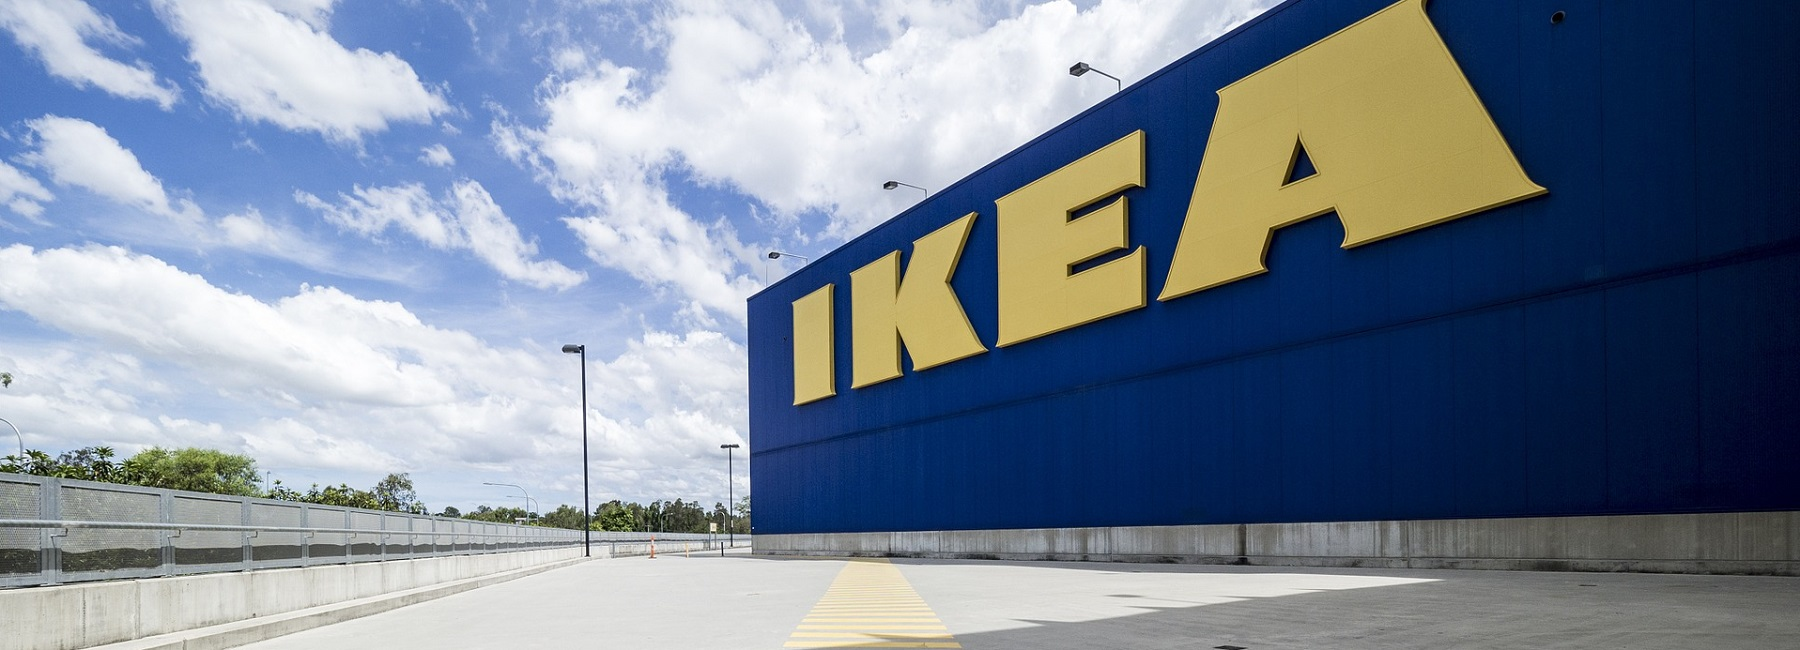 IKEA Fanily Finance pour financer vos projets